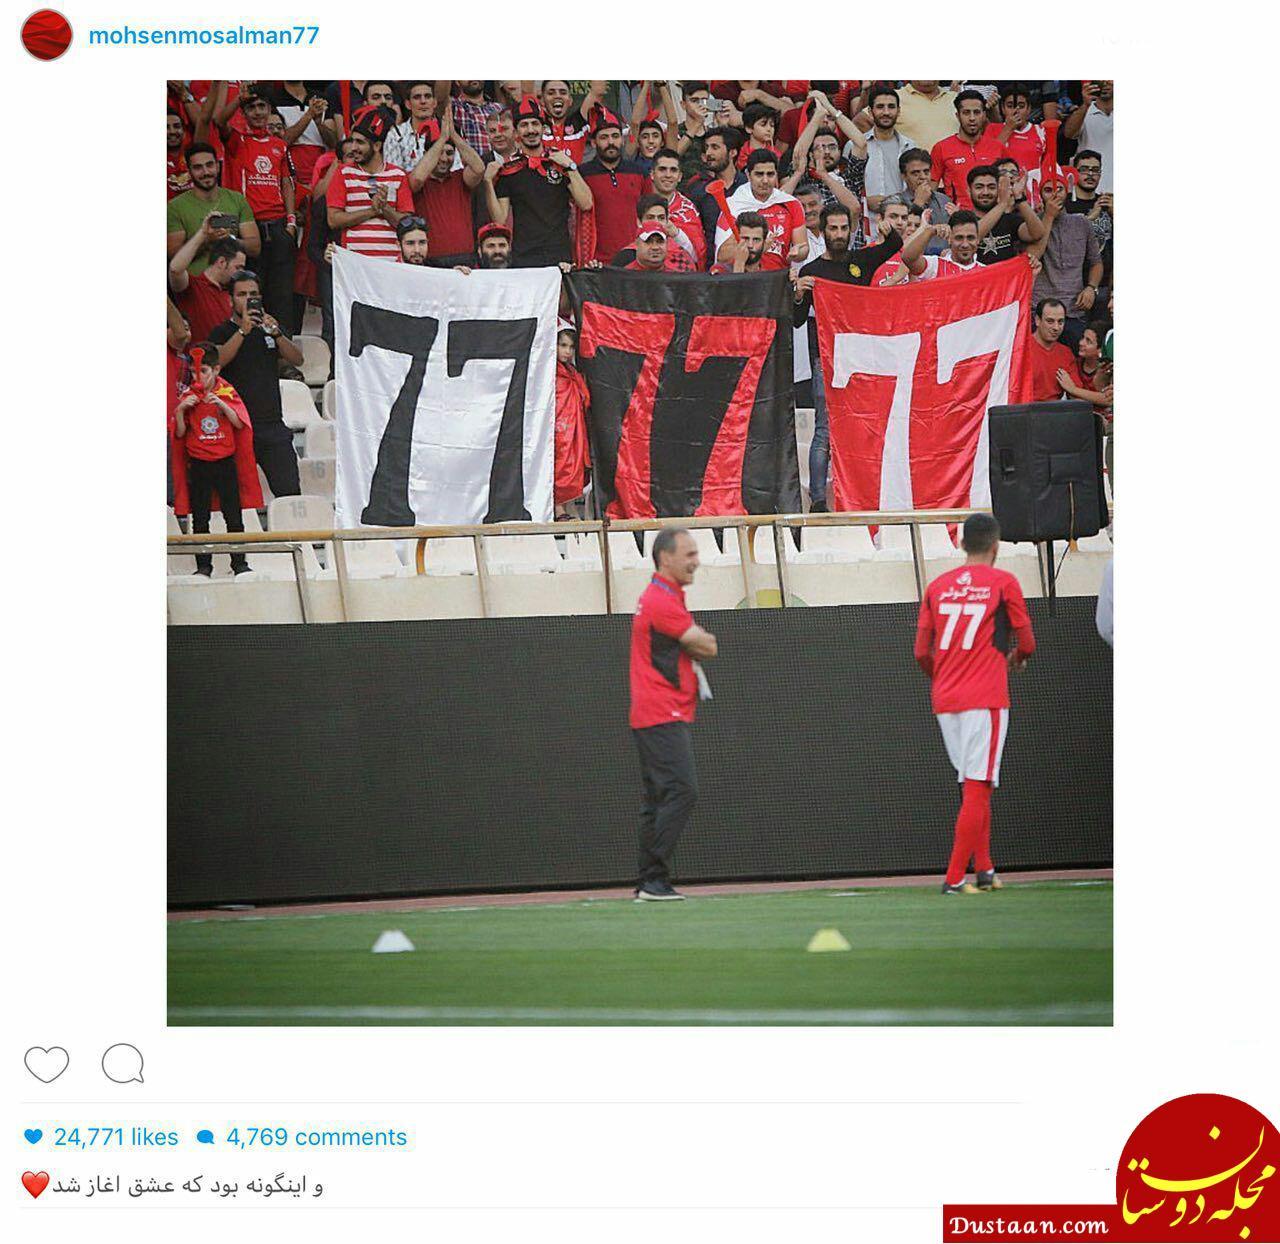 www.dustaan.com تنها پست اینستاگرامی محسن مسلمان بعد از پیروزی! +عکس